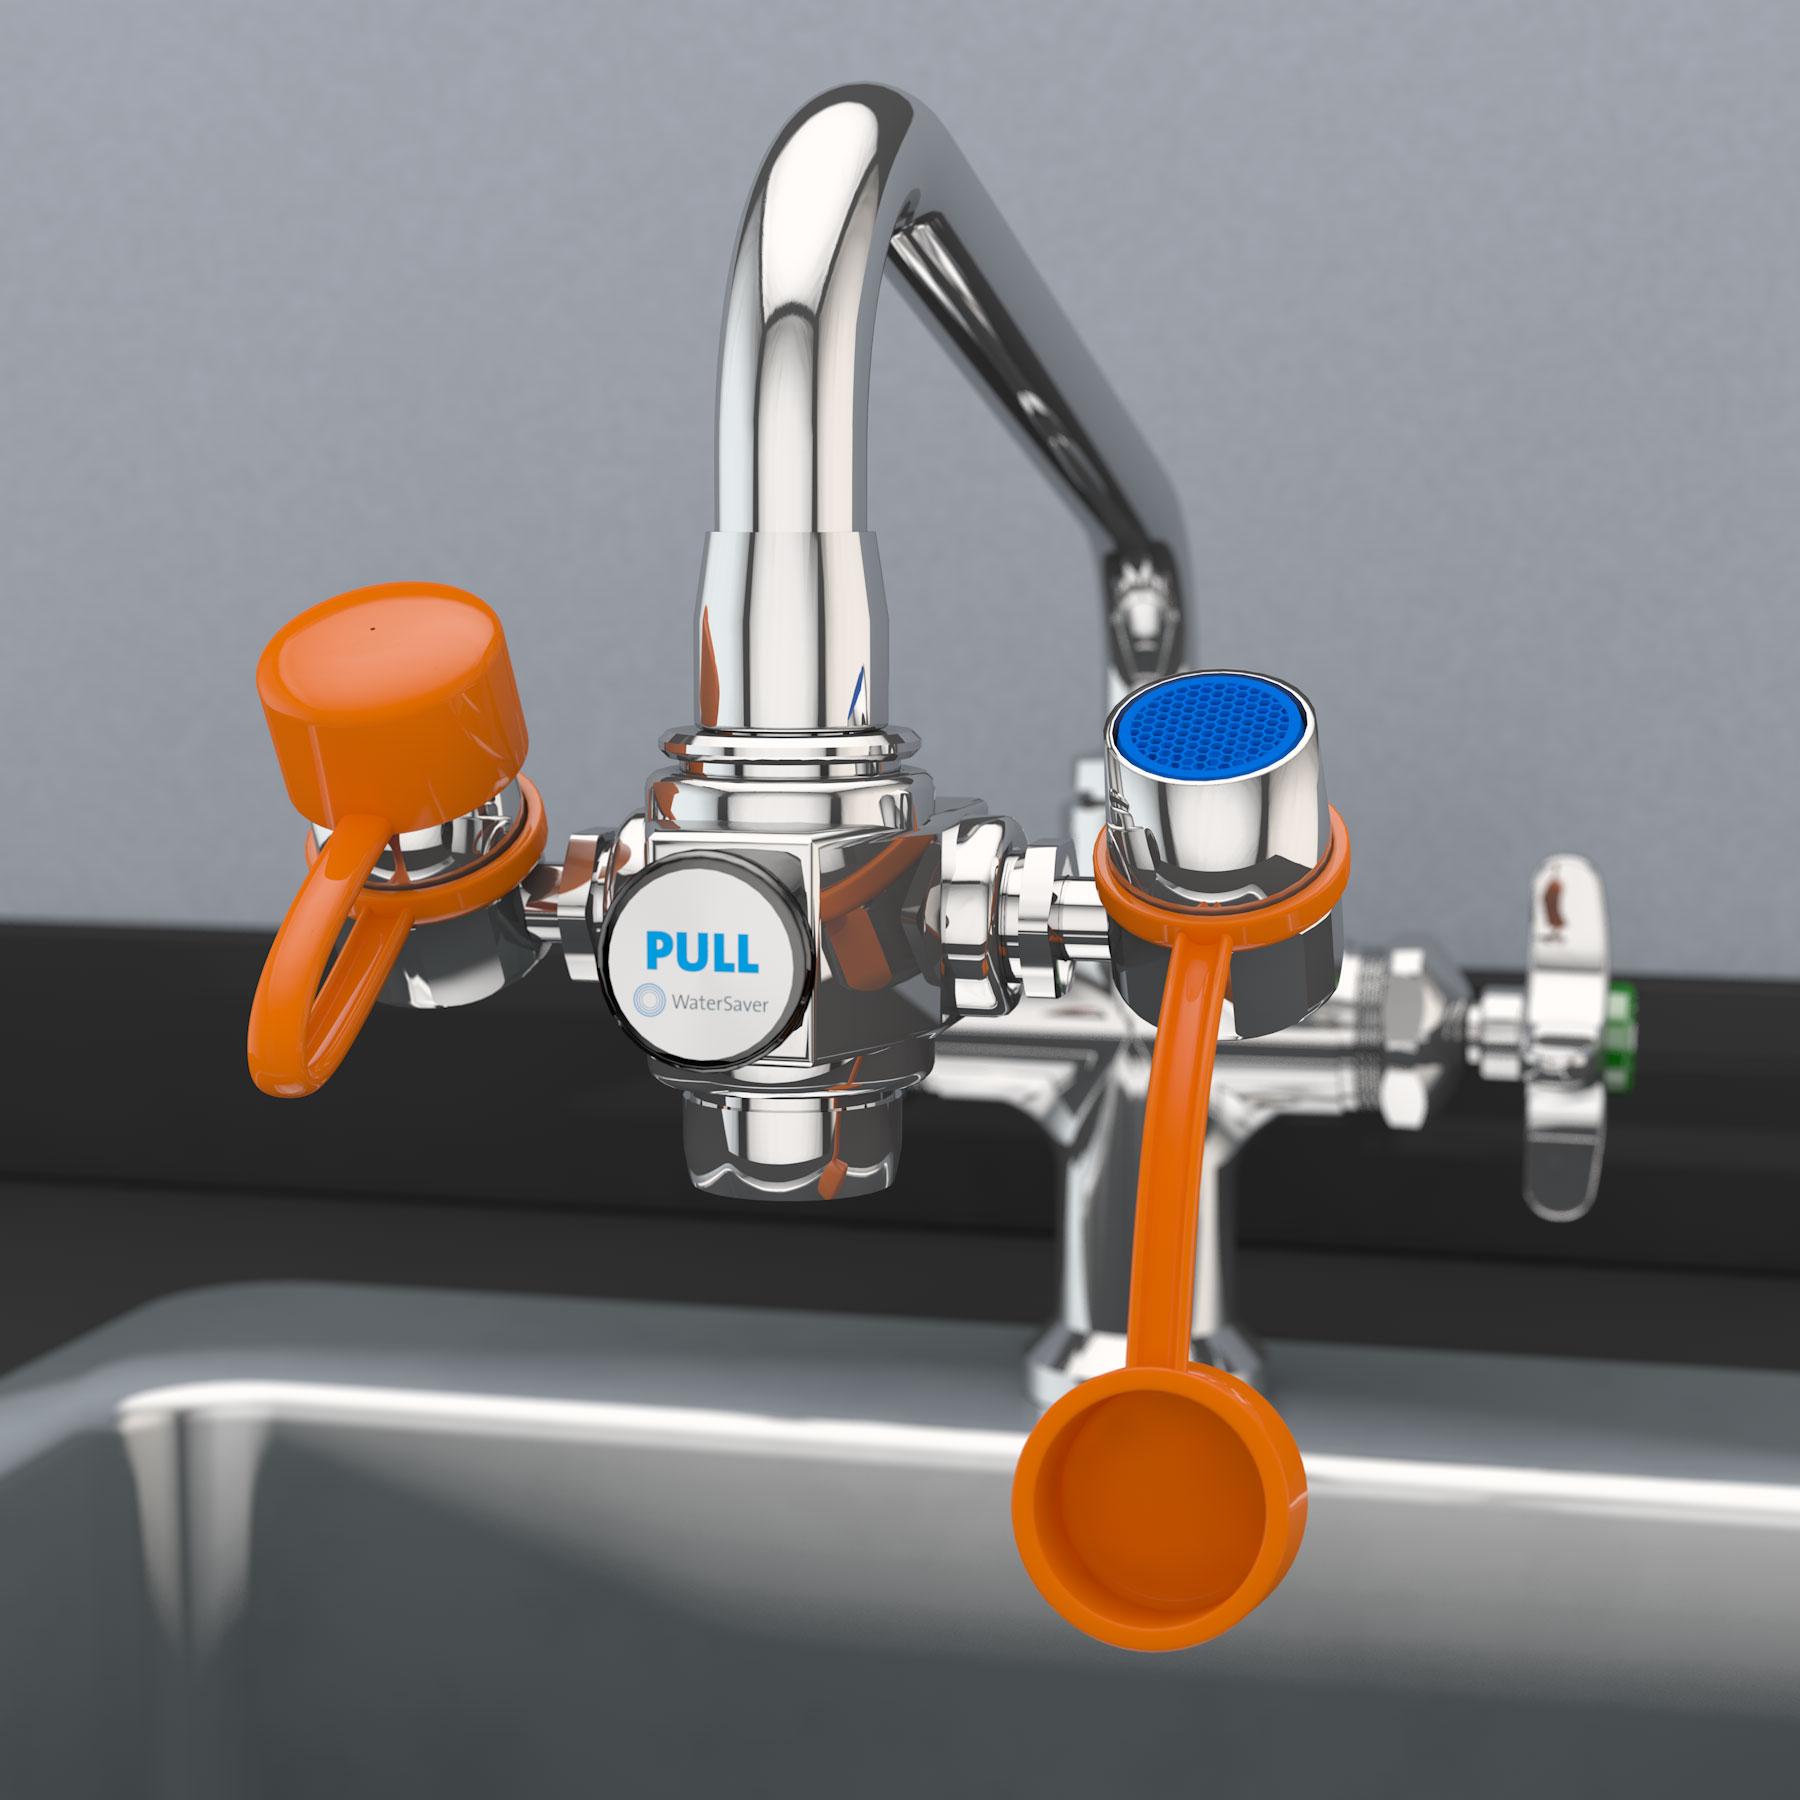 EW100 – WaterSaver Faucet Co.